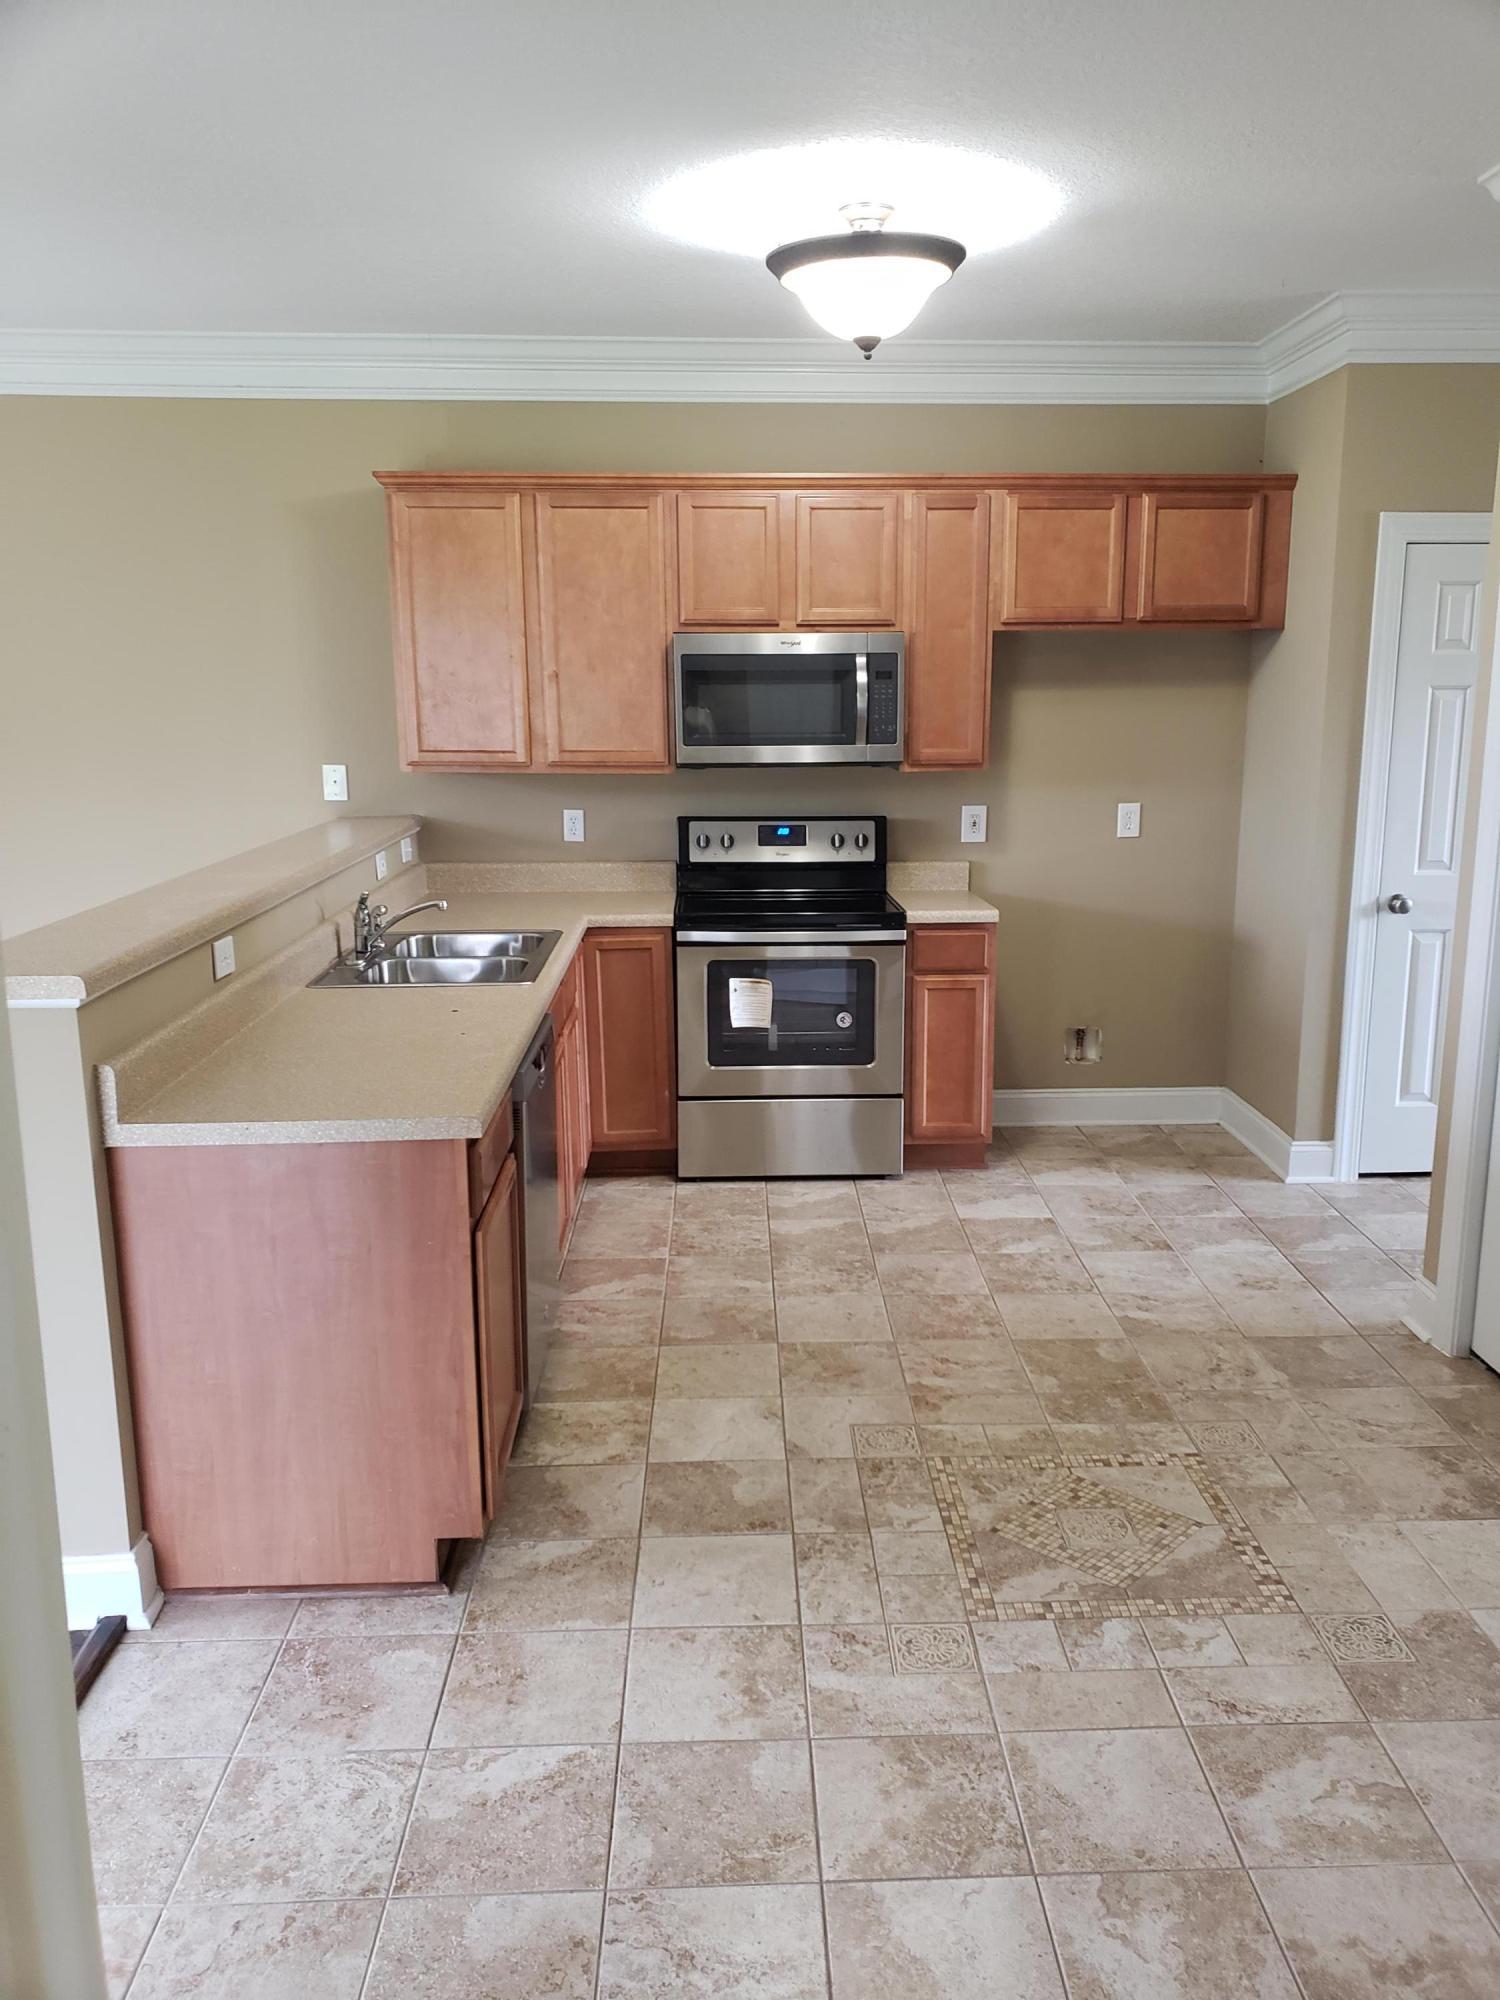 Montague Pointe Homes For Sale - 100 Gavins, Goose Creek, SC - 18